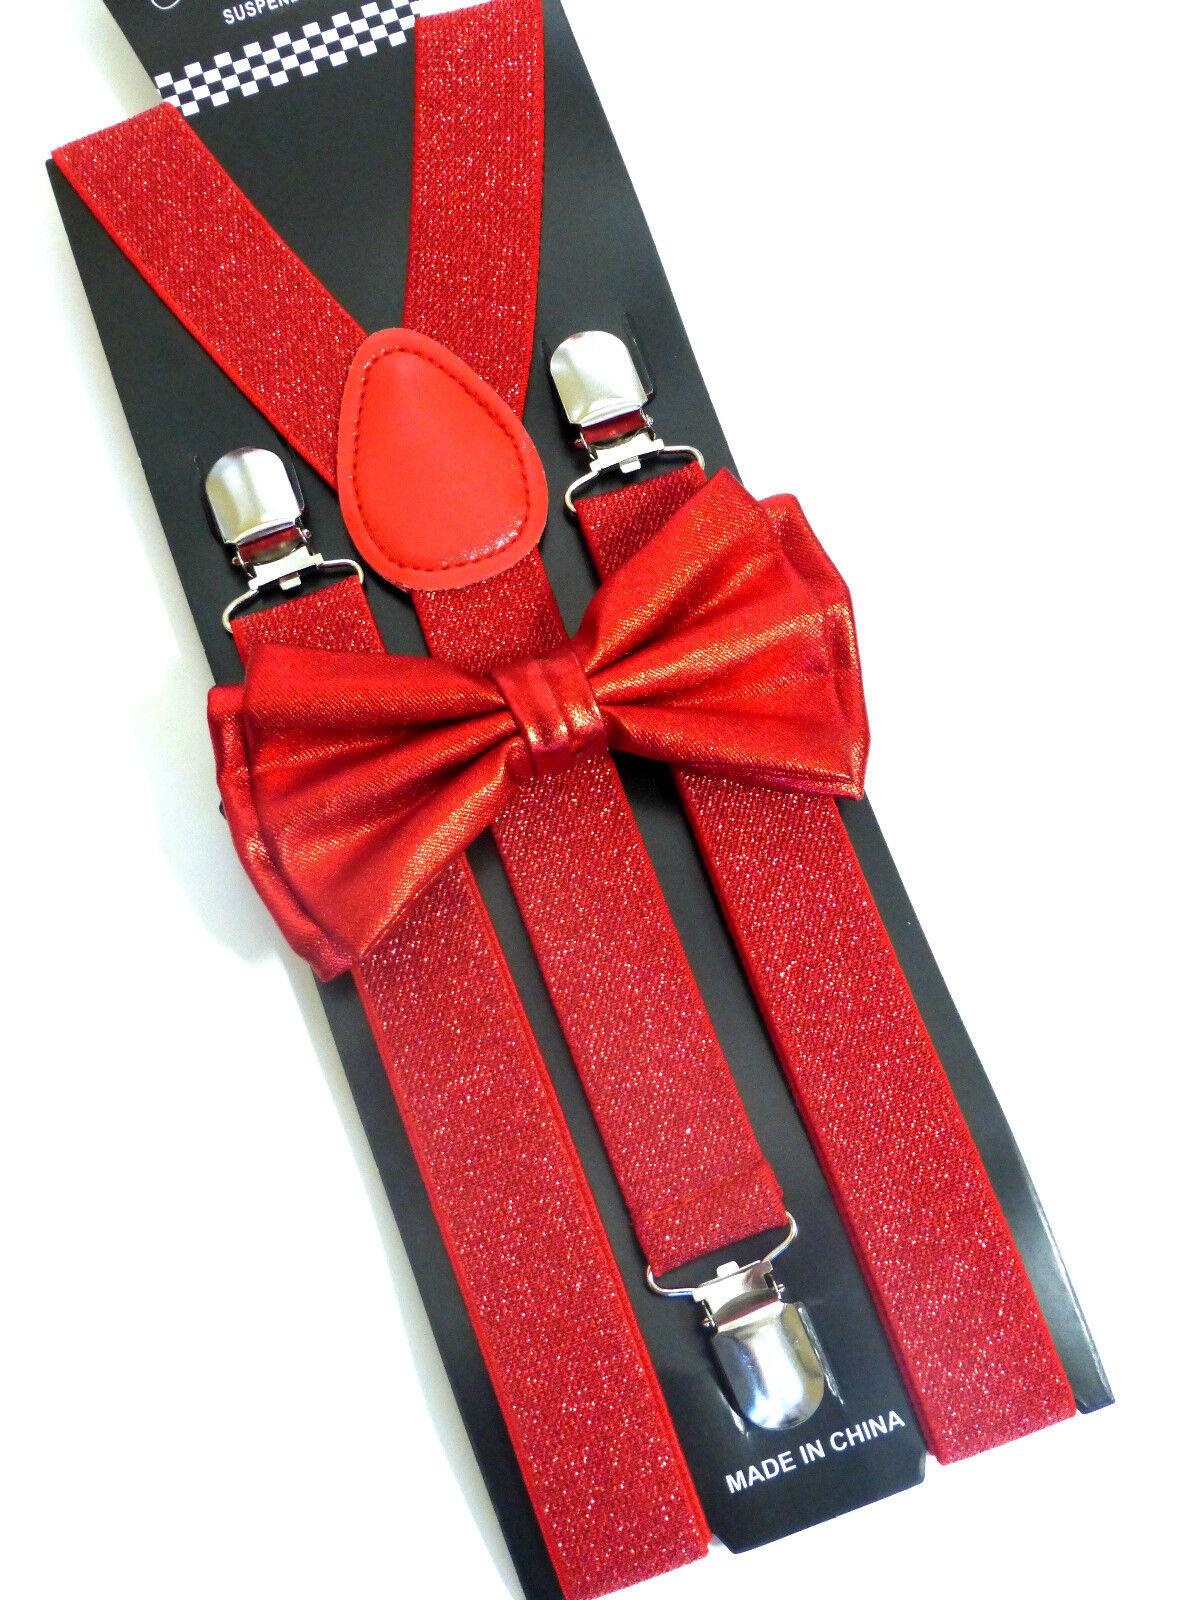 New Metallic Red Bow Tie & Matching Suspender Tuxedo Wedding Accessories